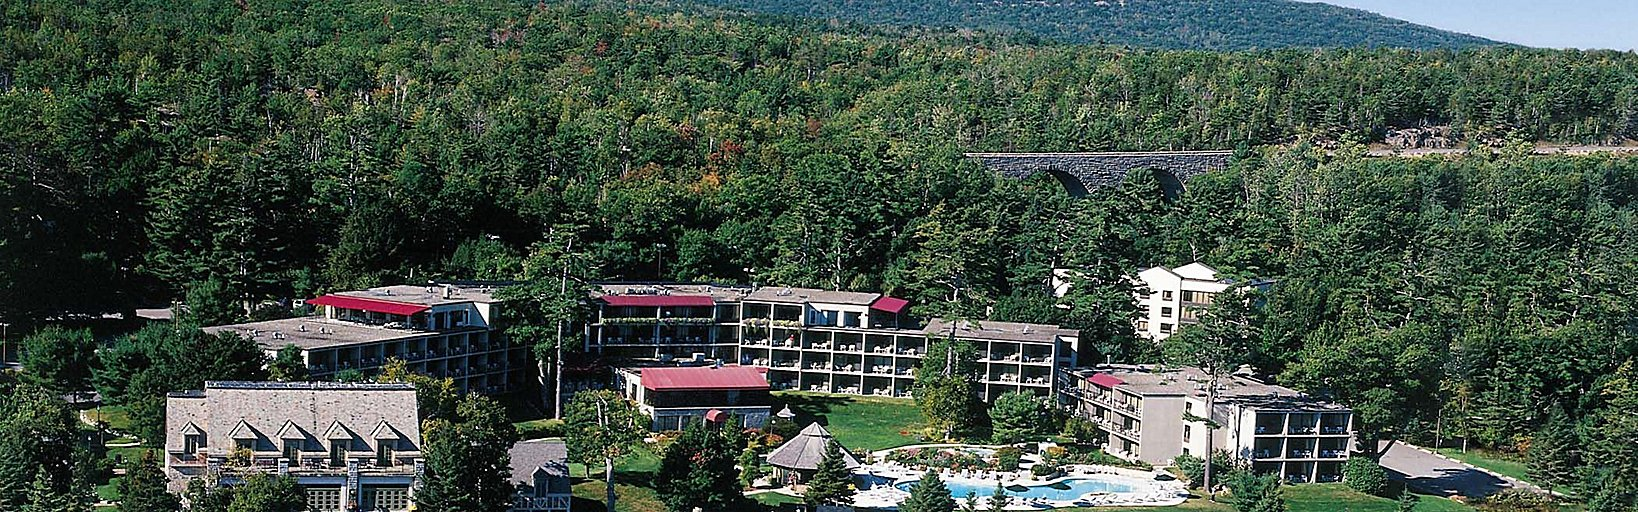 Bar Harbor Maine Hotels >> Holiday Inn Resort Bar Harbor Acadia Natl Park Hotel By Ihg